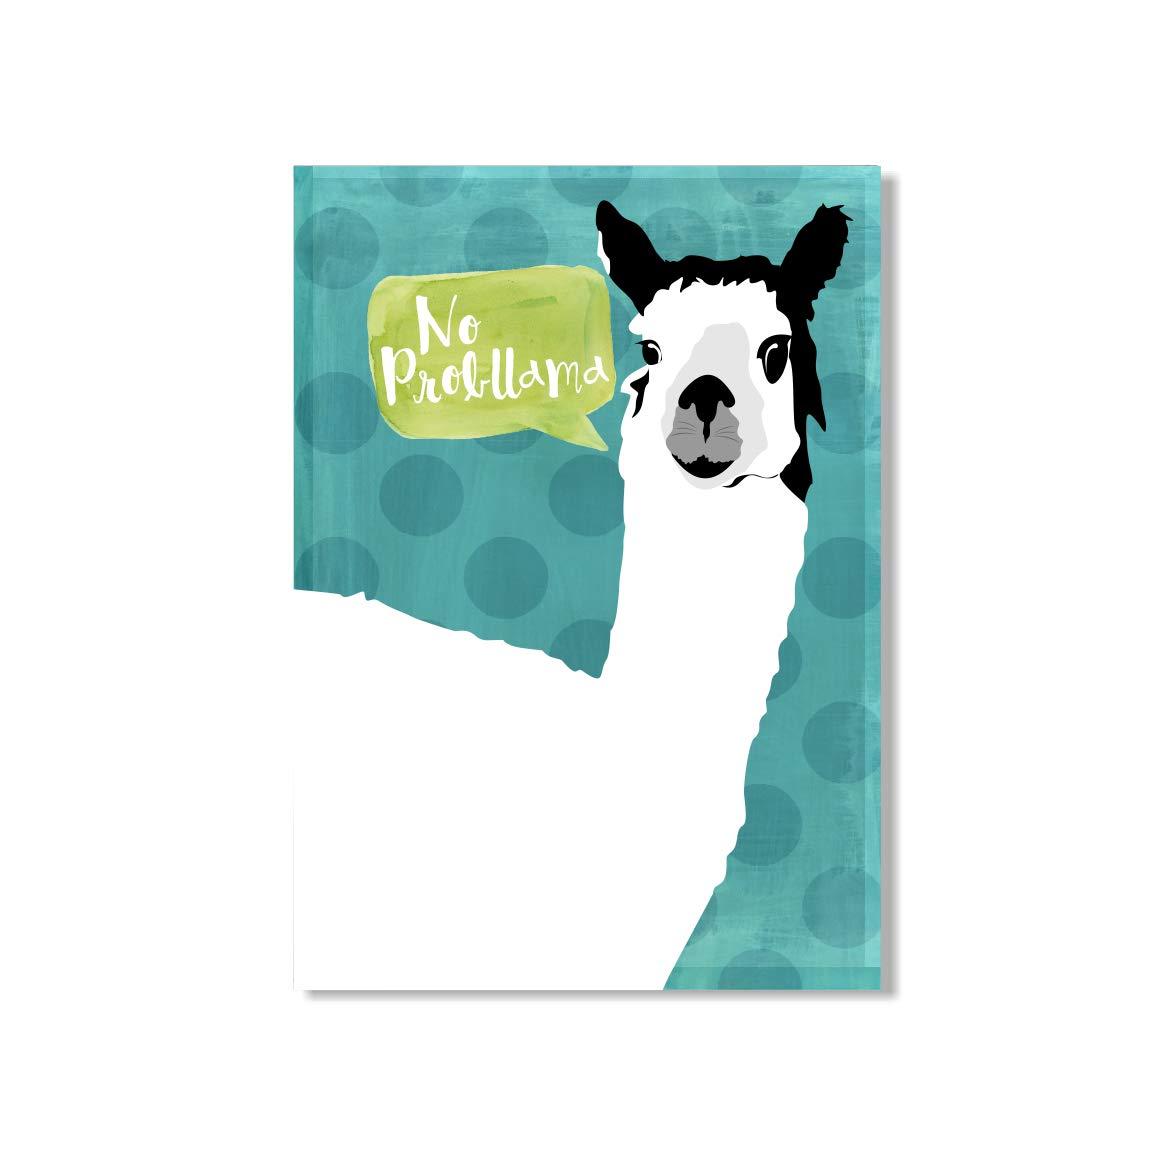 No prob llama Birthday pun cards Funny Llama Card Punny Llama Card Llama lovers gift No probllama card